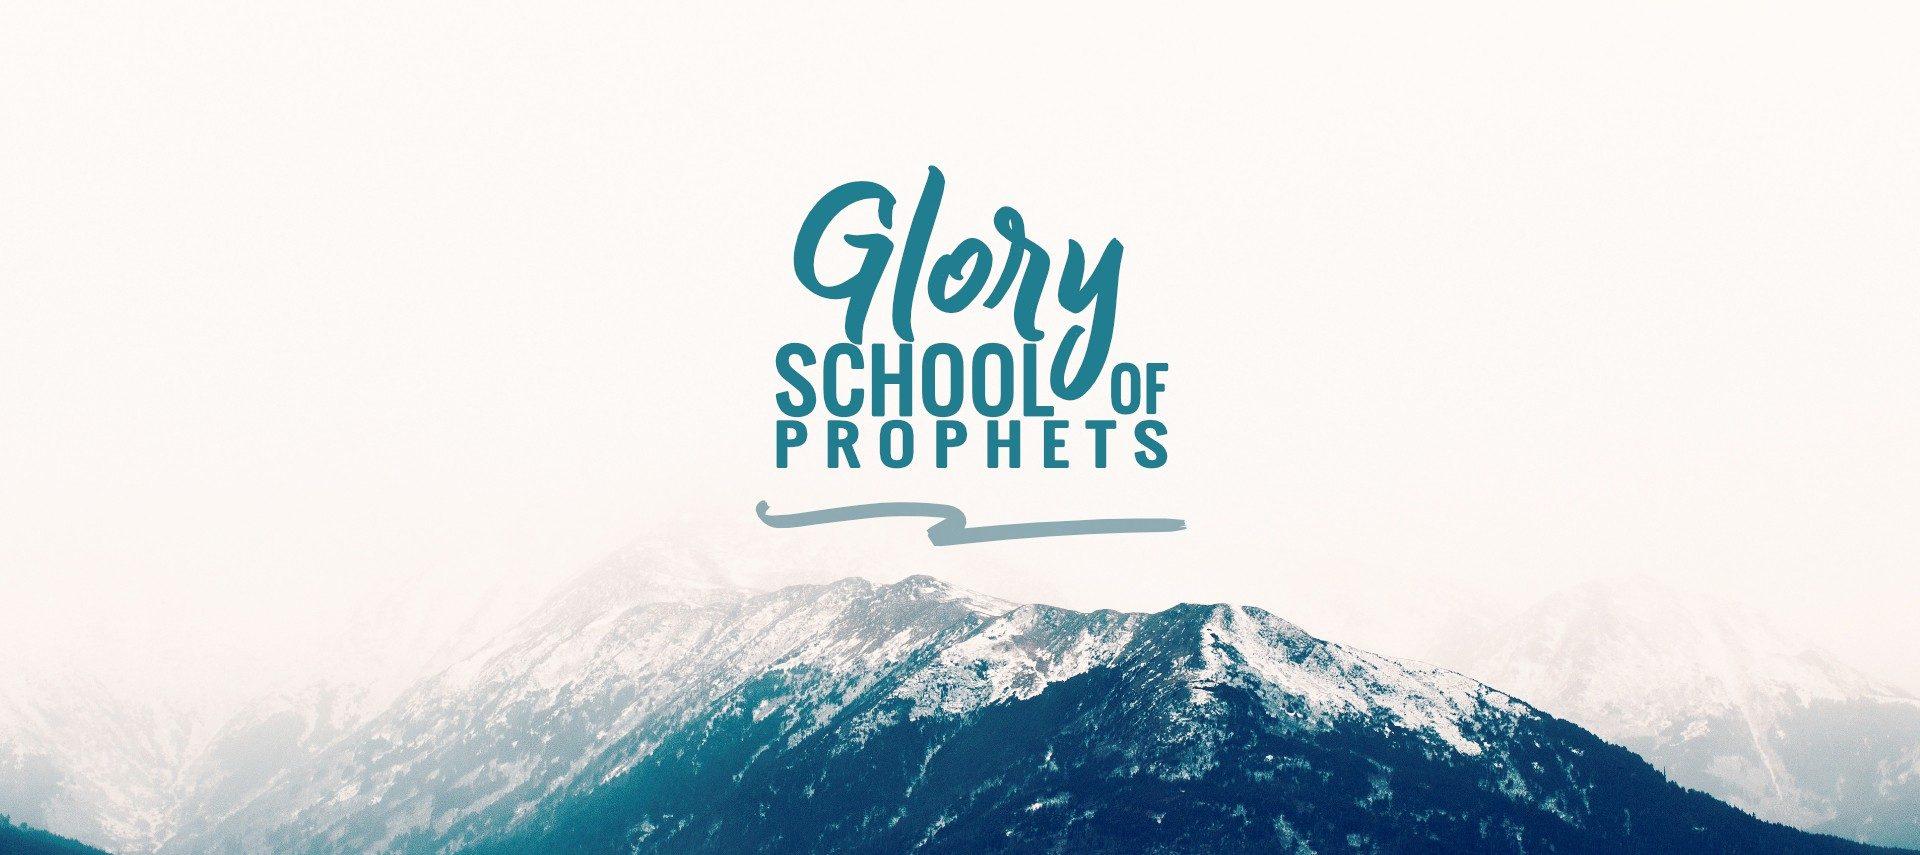 Glory School of Prophets 2019